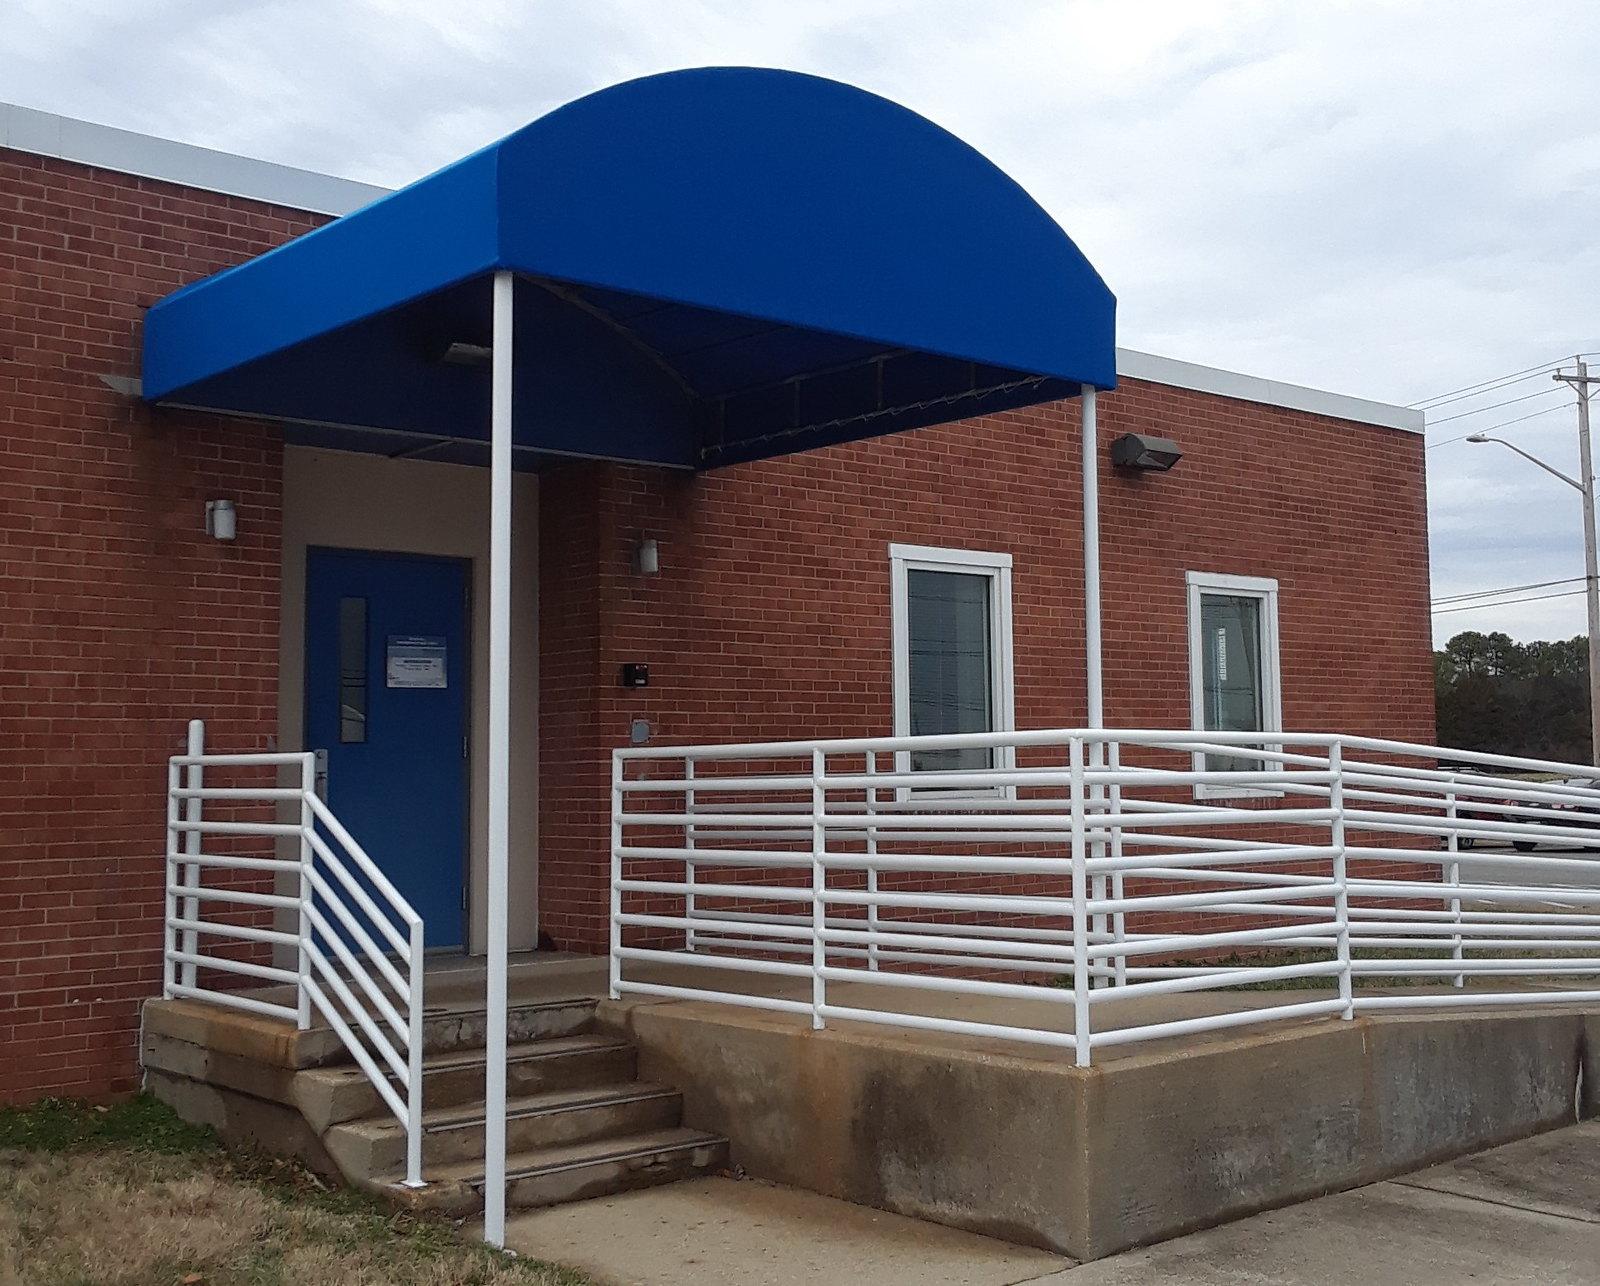 Entrance-Canopy-Building